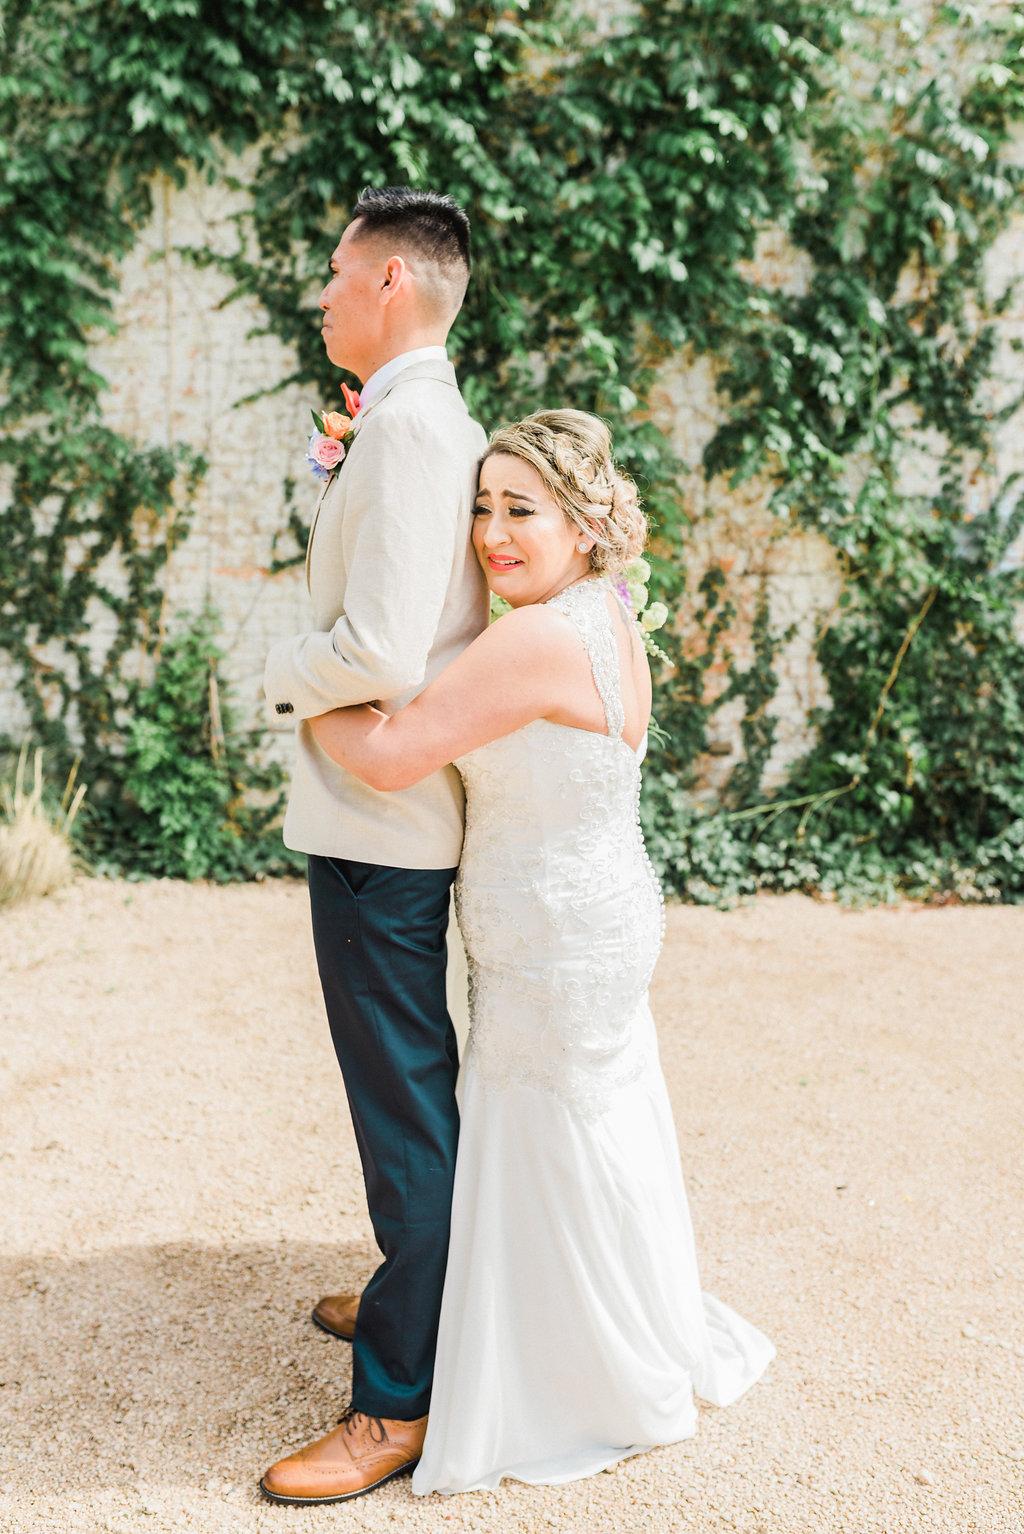 wedding first looks - https://ruffledblog.com/modern-playful-texas-carnival-wedding